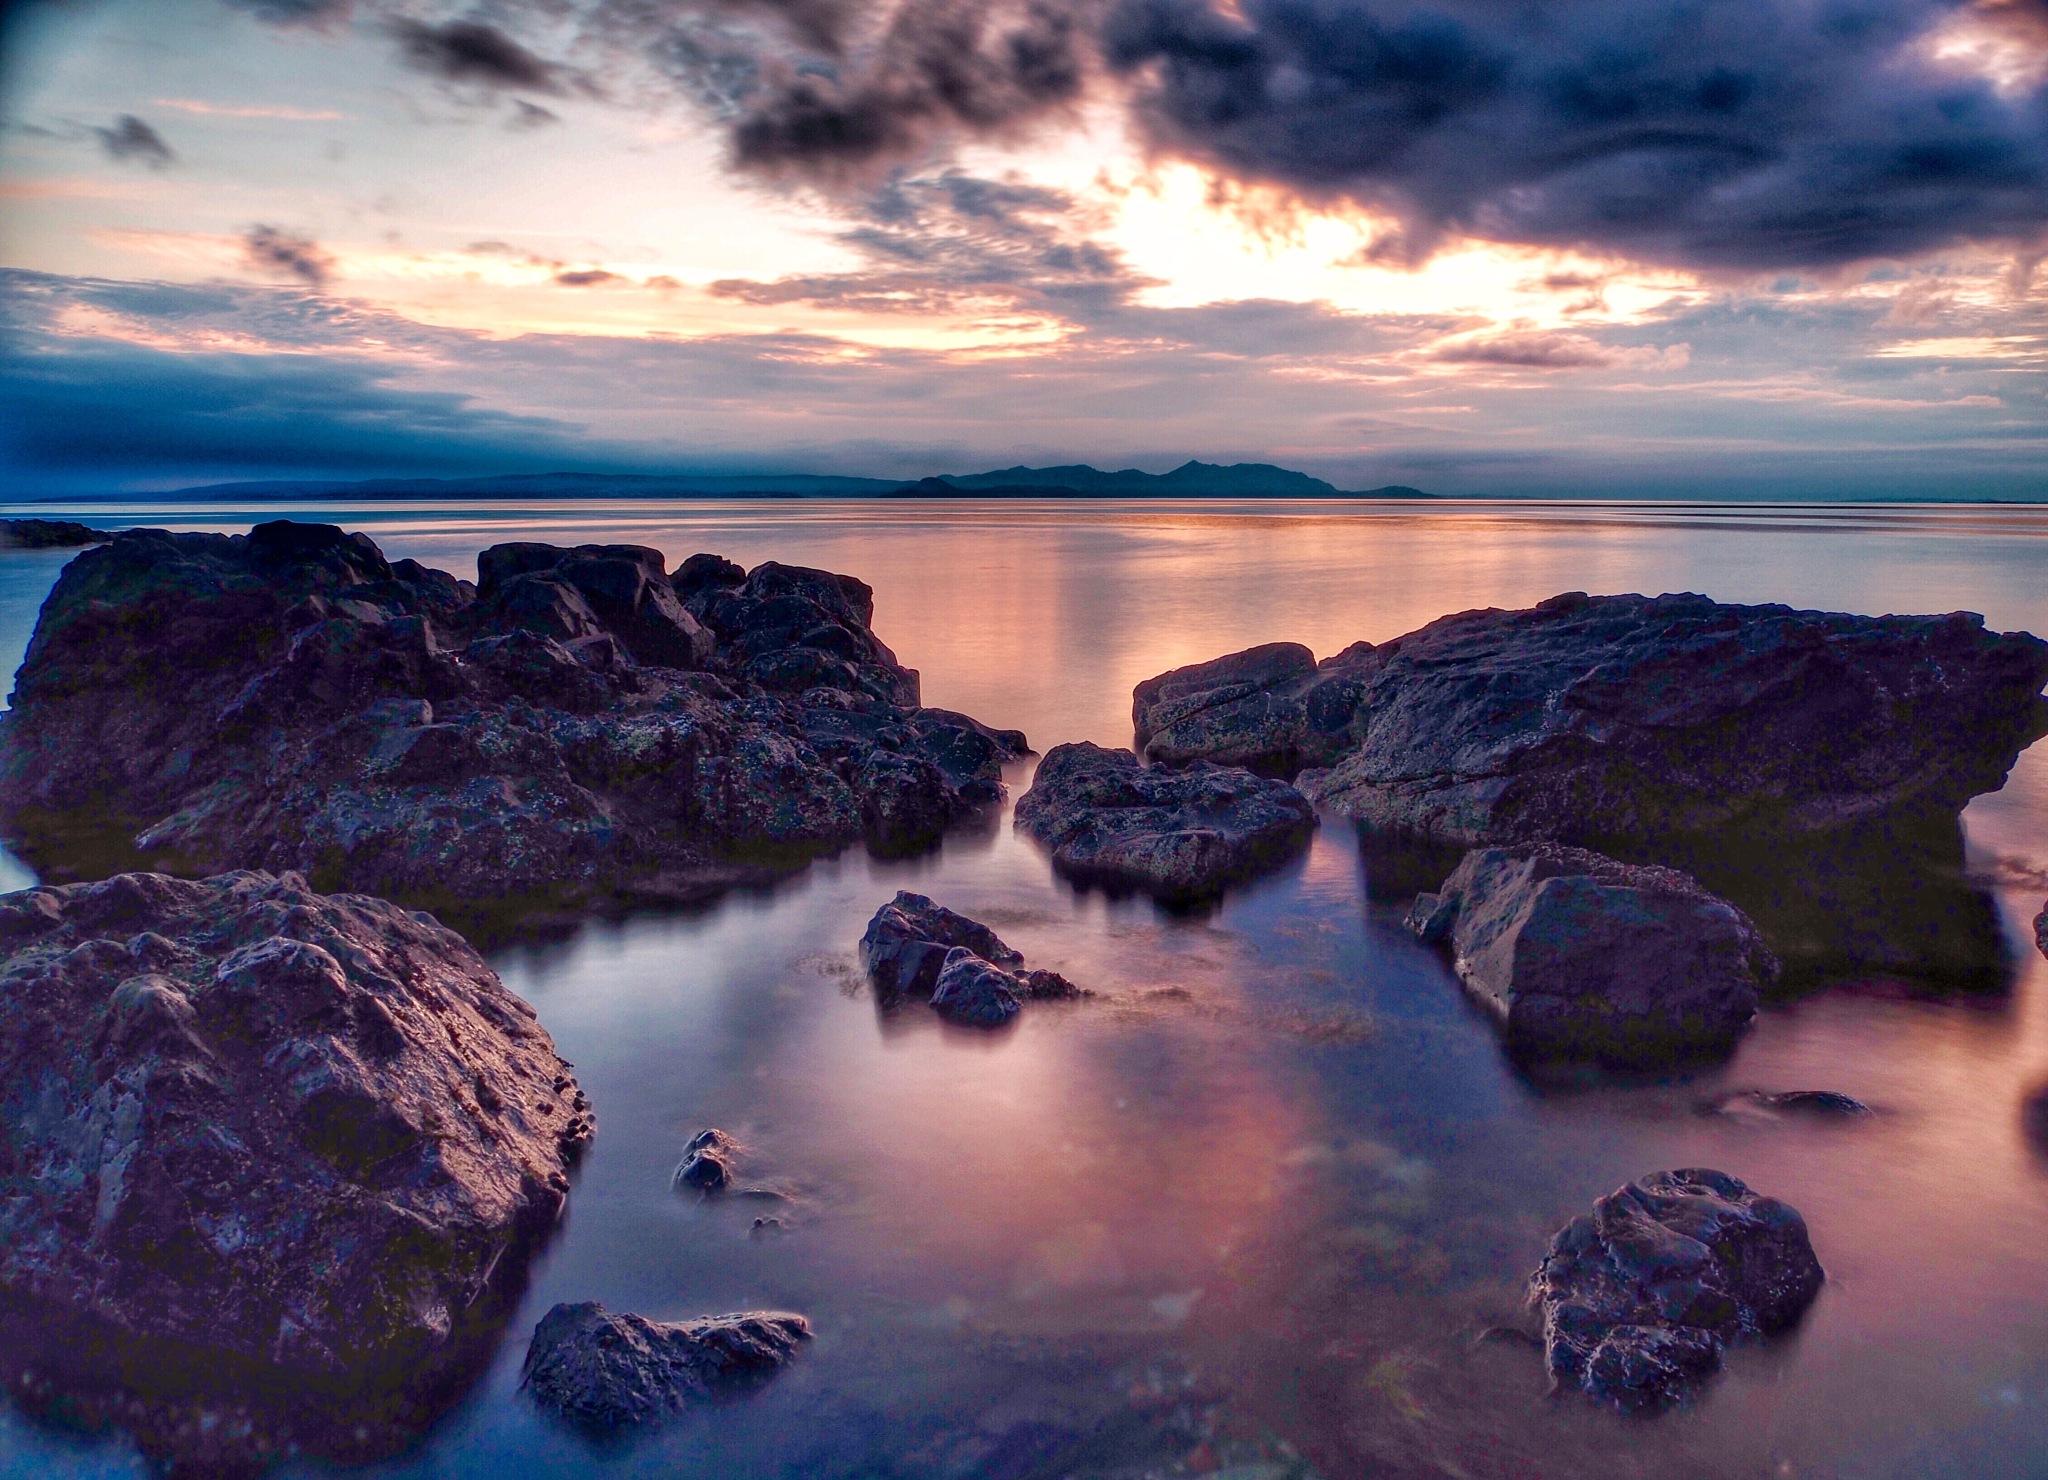 Dunure Scotland  by Stephen Miller